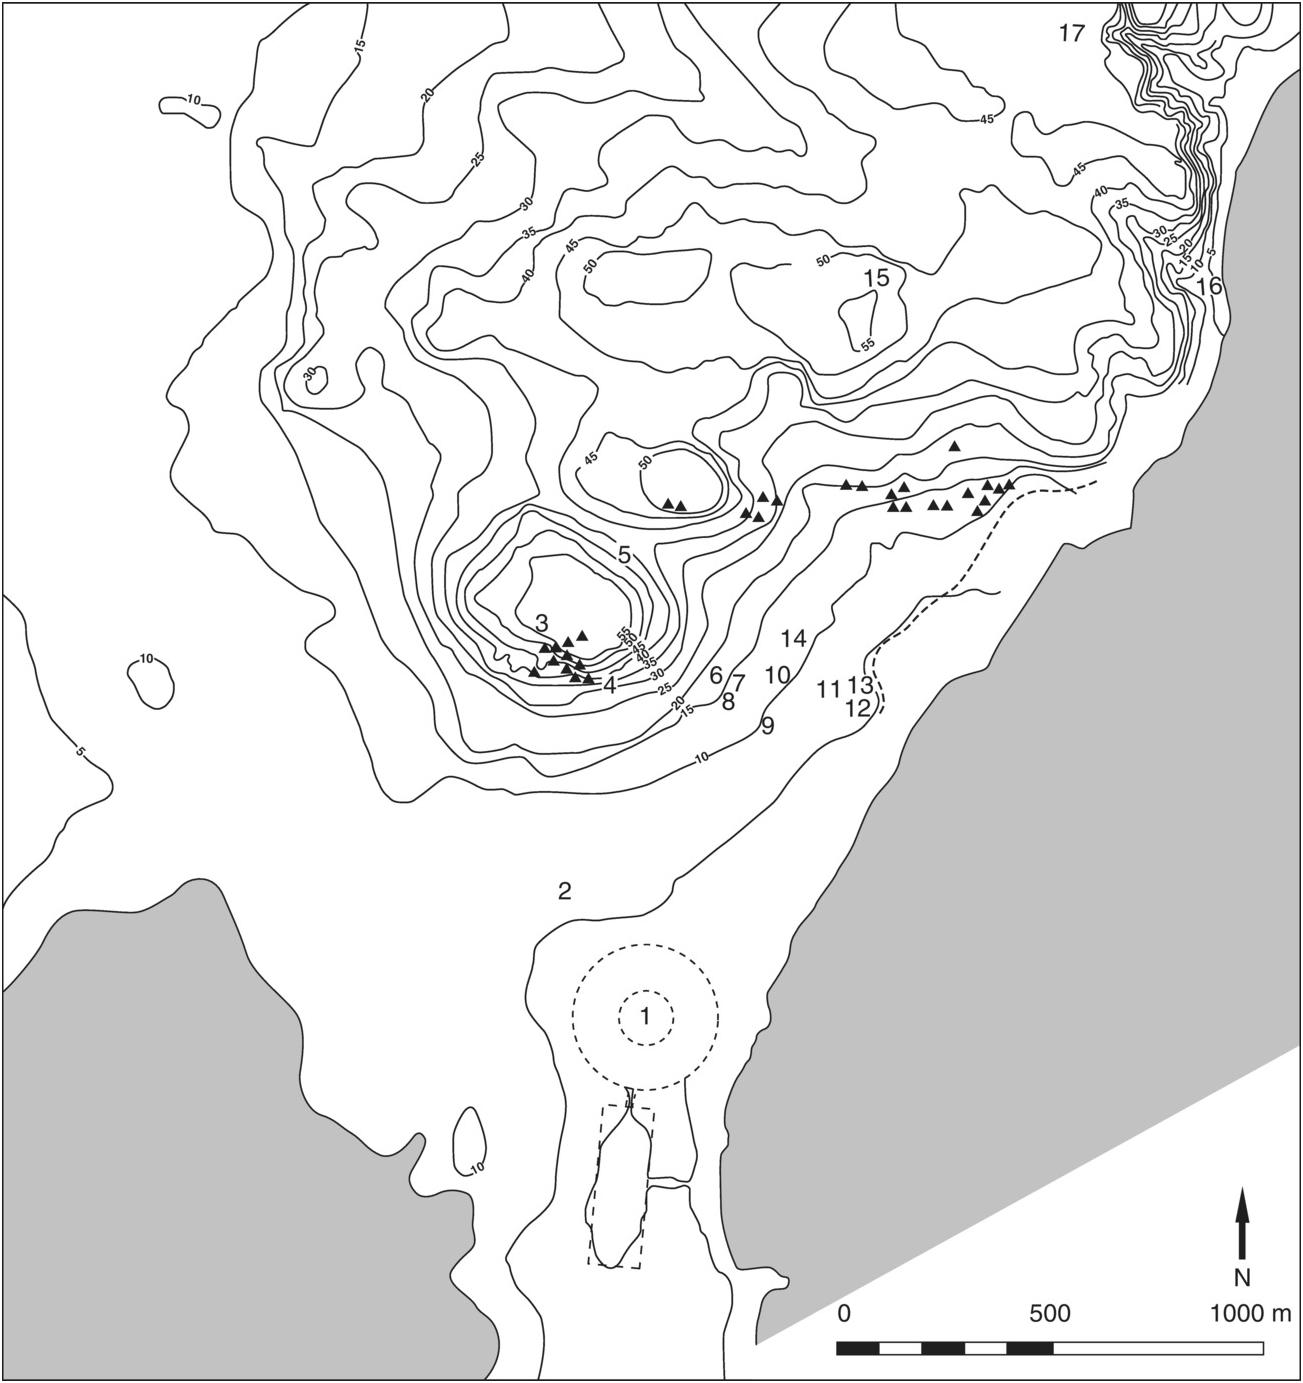 Case studies (Part II) - The Punic Mediterranean